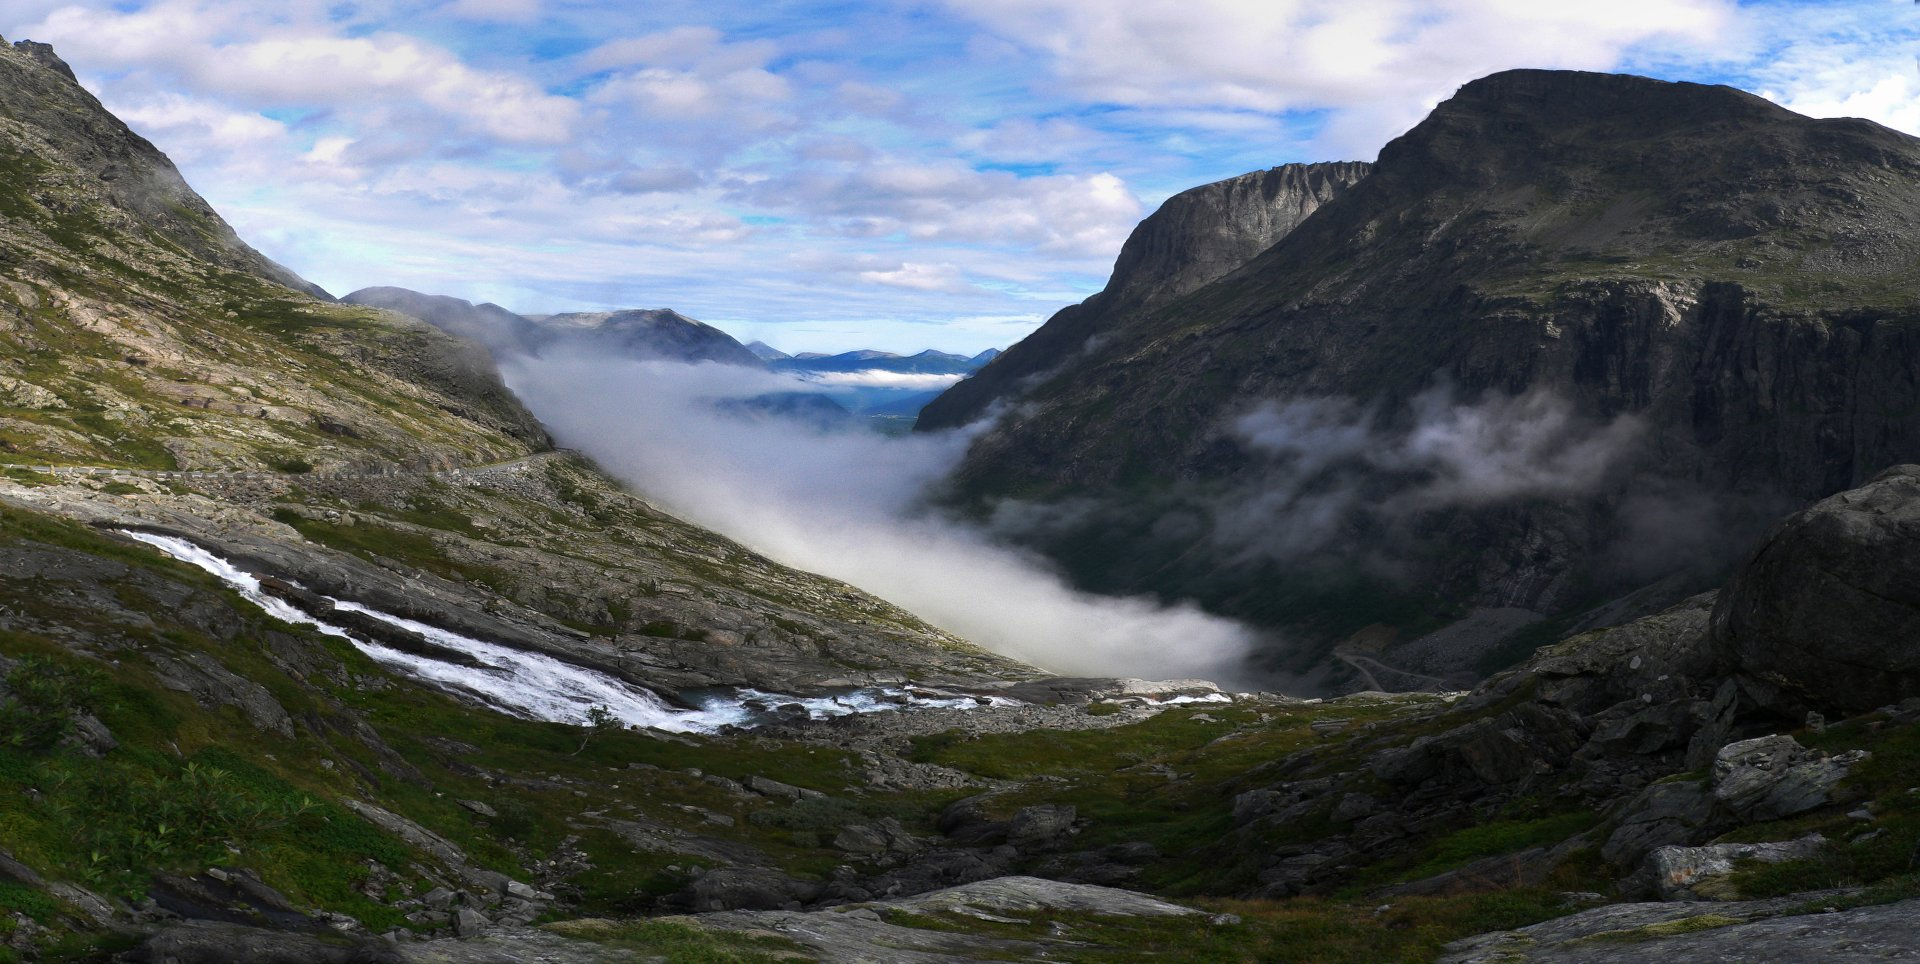 P1060629 Trollstigveien corr 2 Noorwegen 3_1920x964